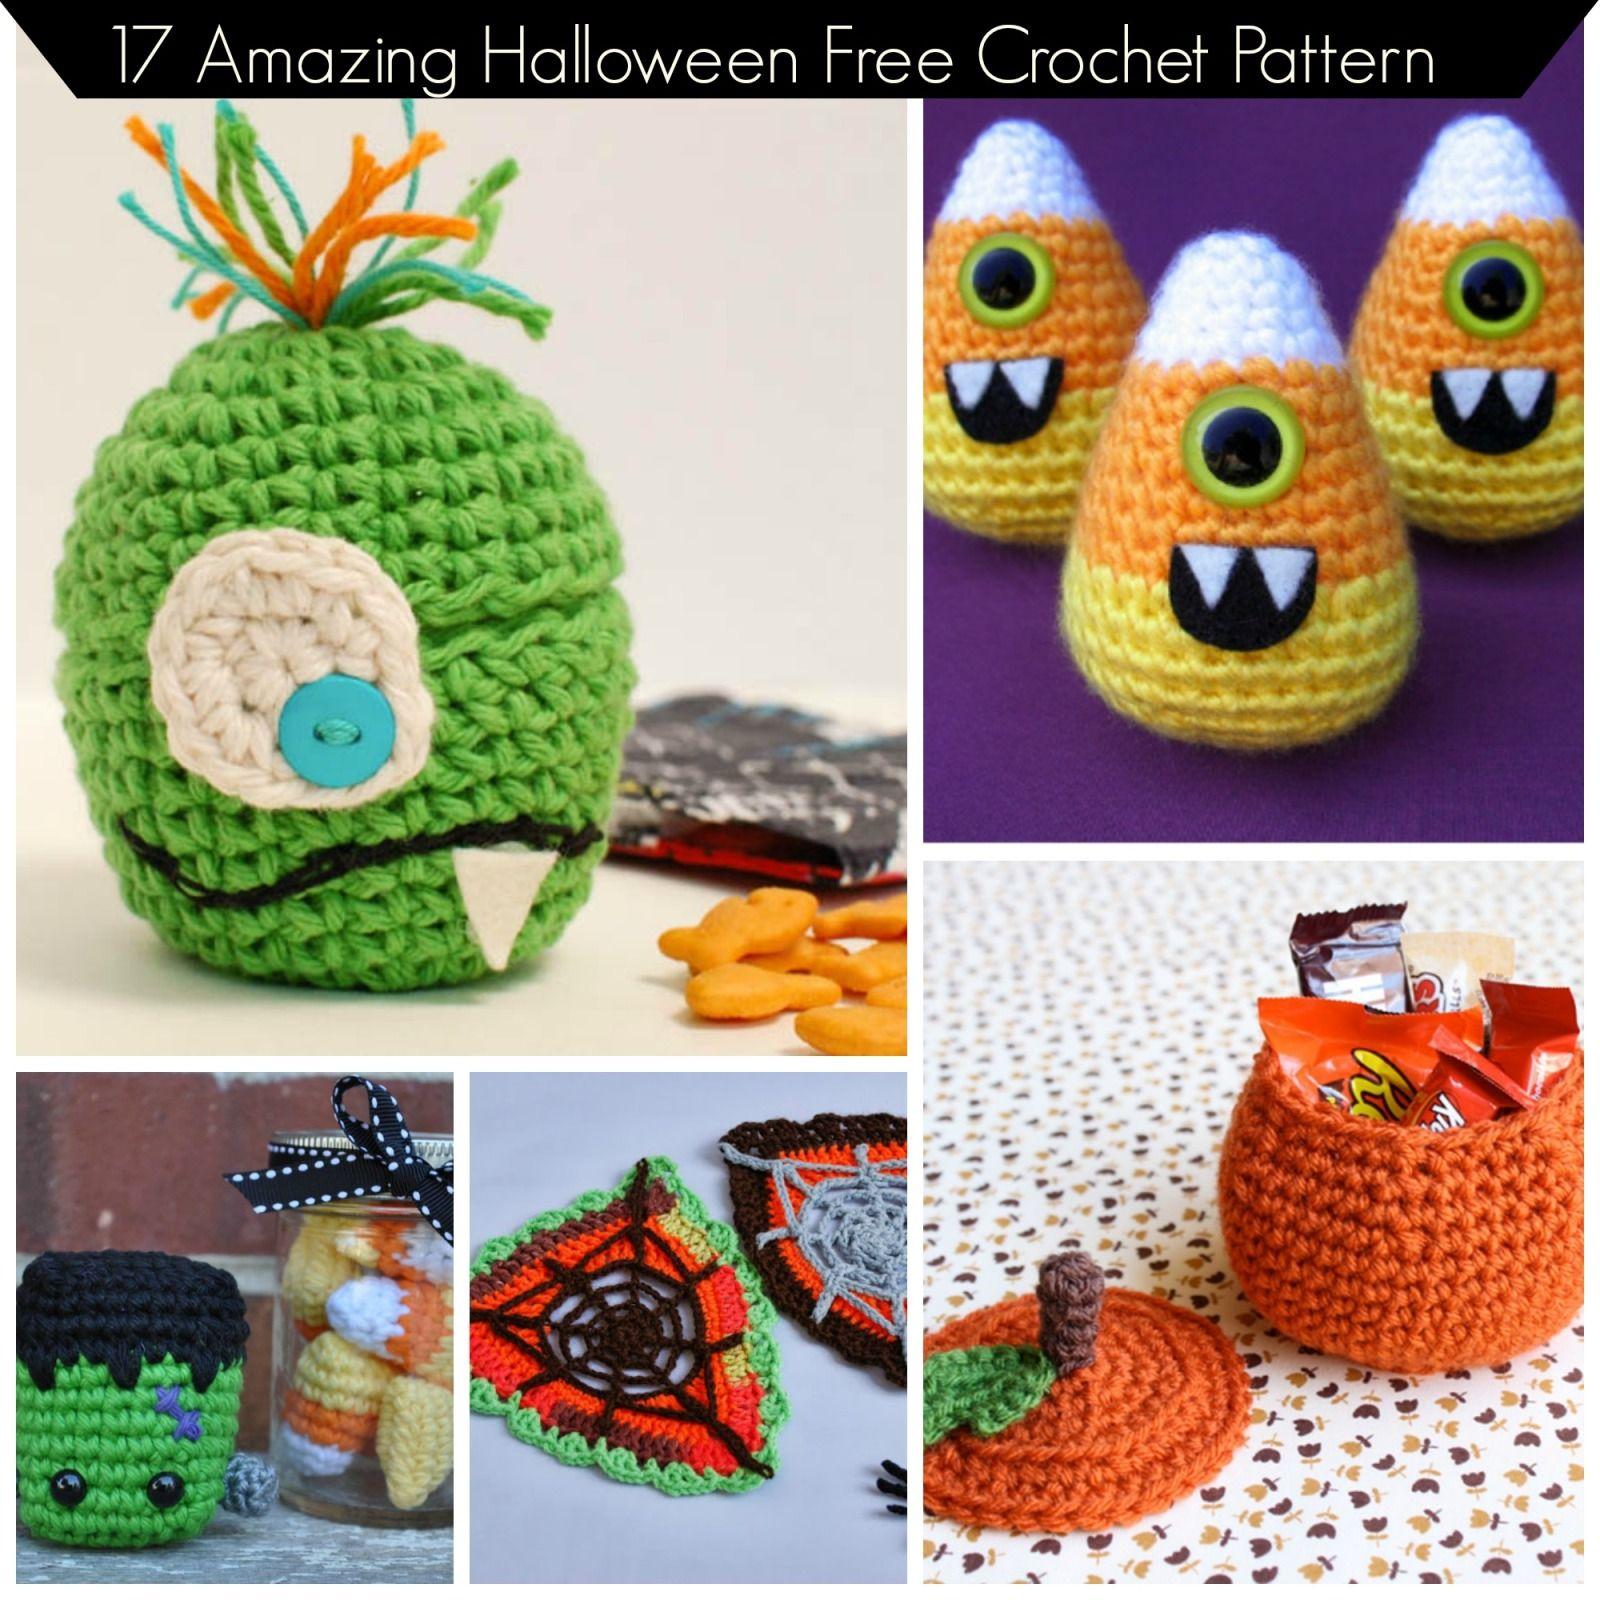 17 Amazing Halloween Free Crochet Pattern | The WHOot Best Crochet ...